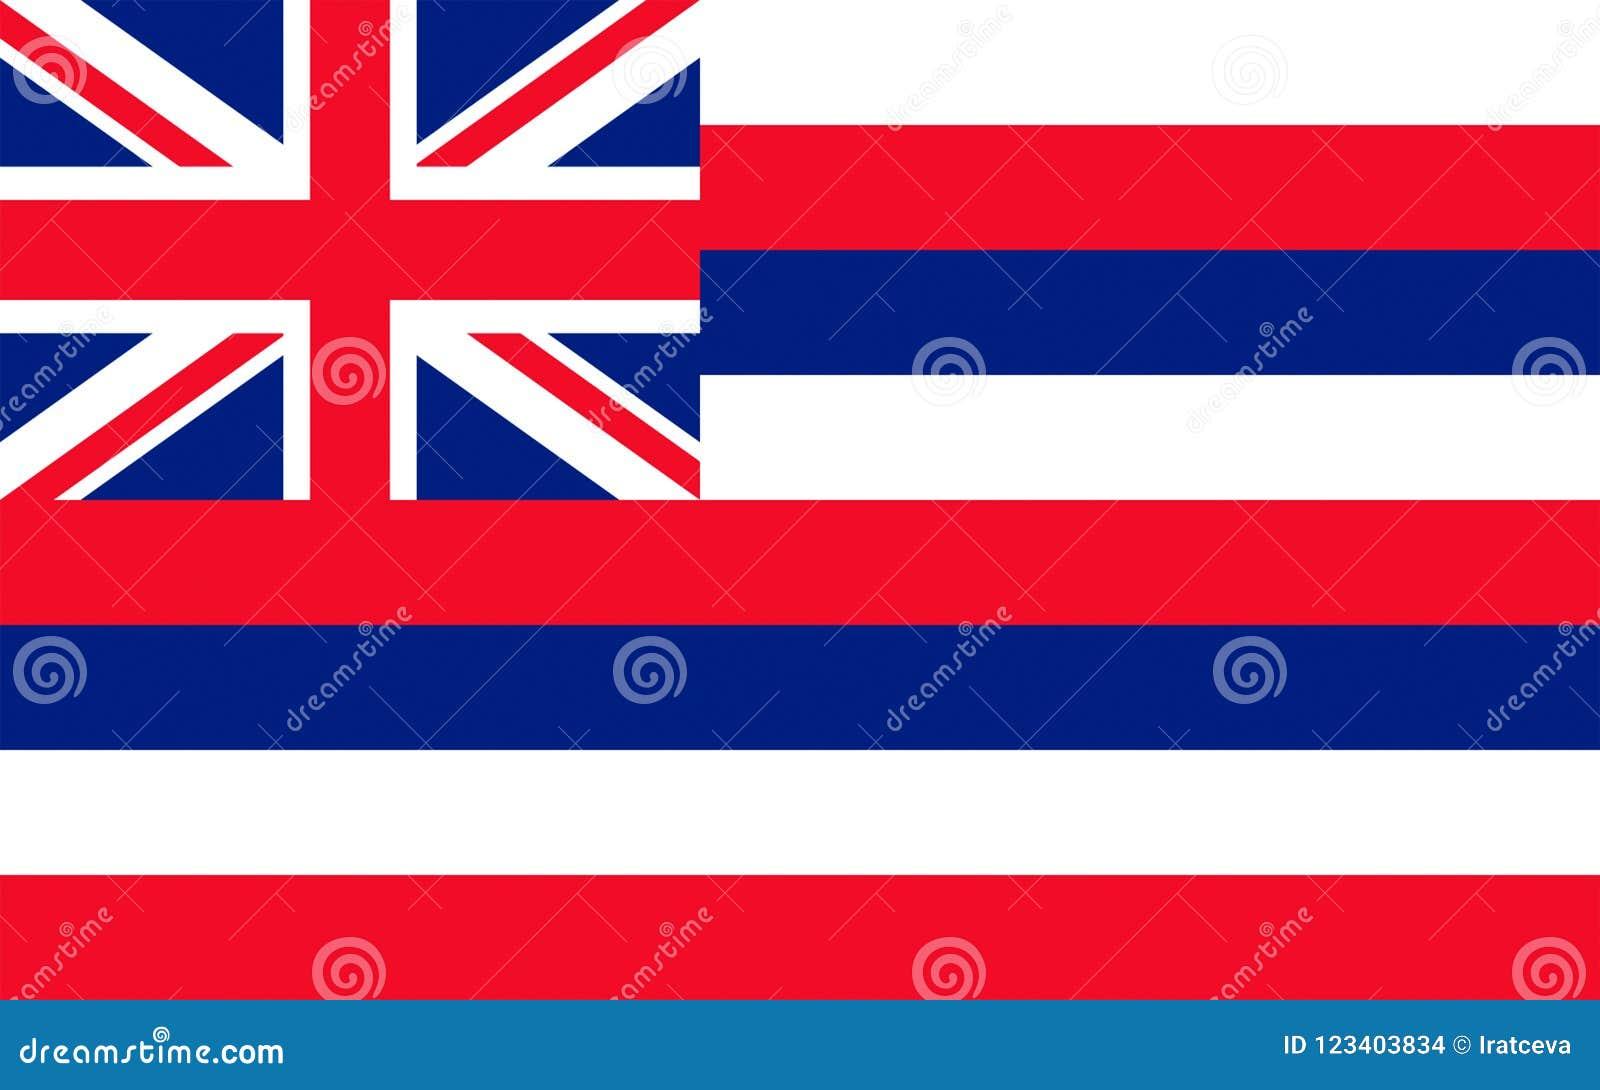 Flag of Hawaii, USA